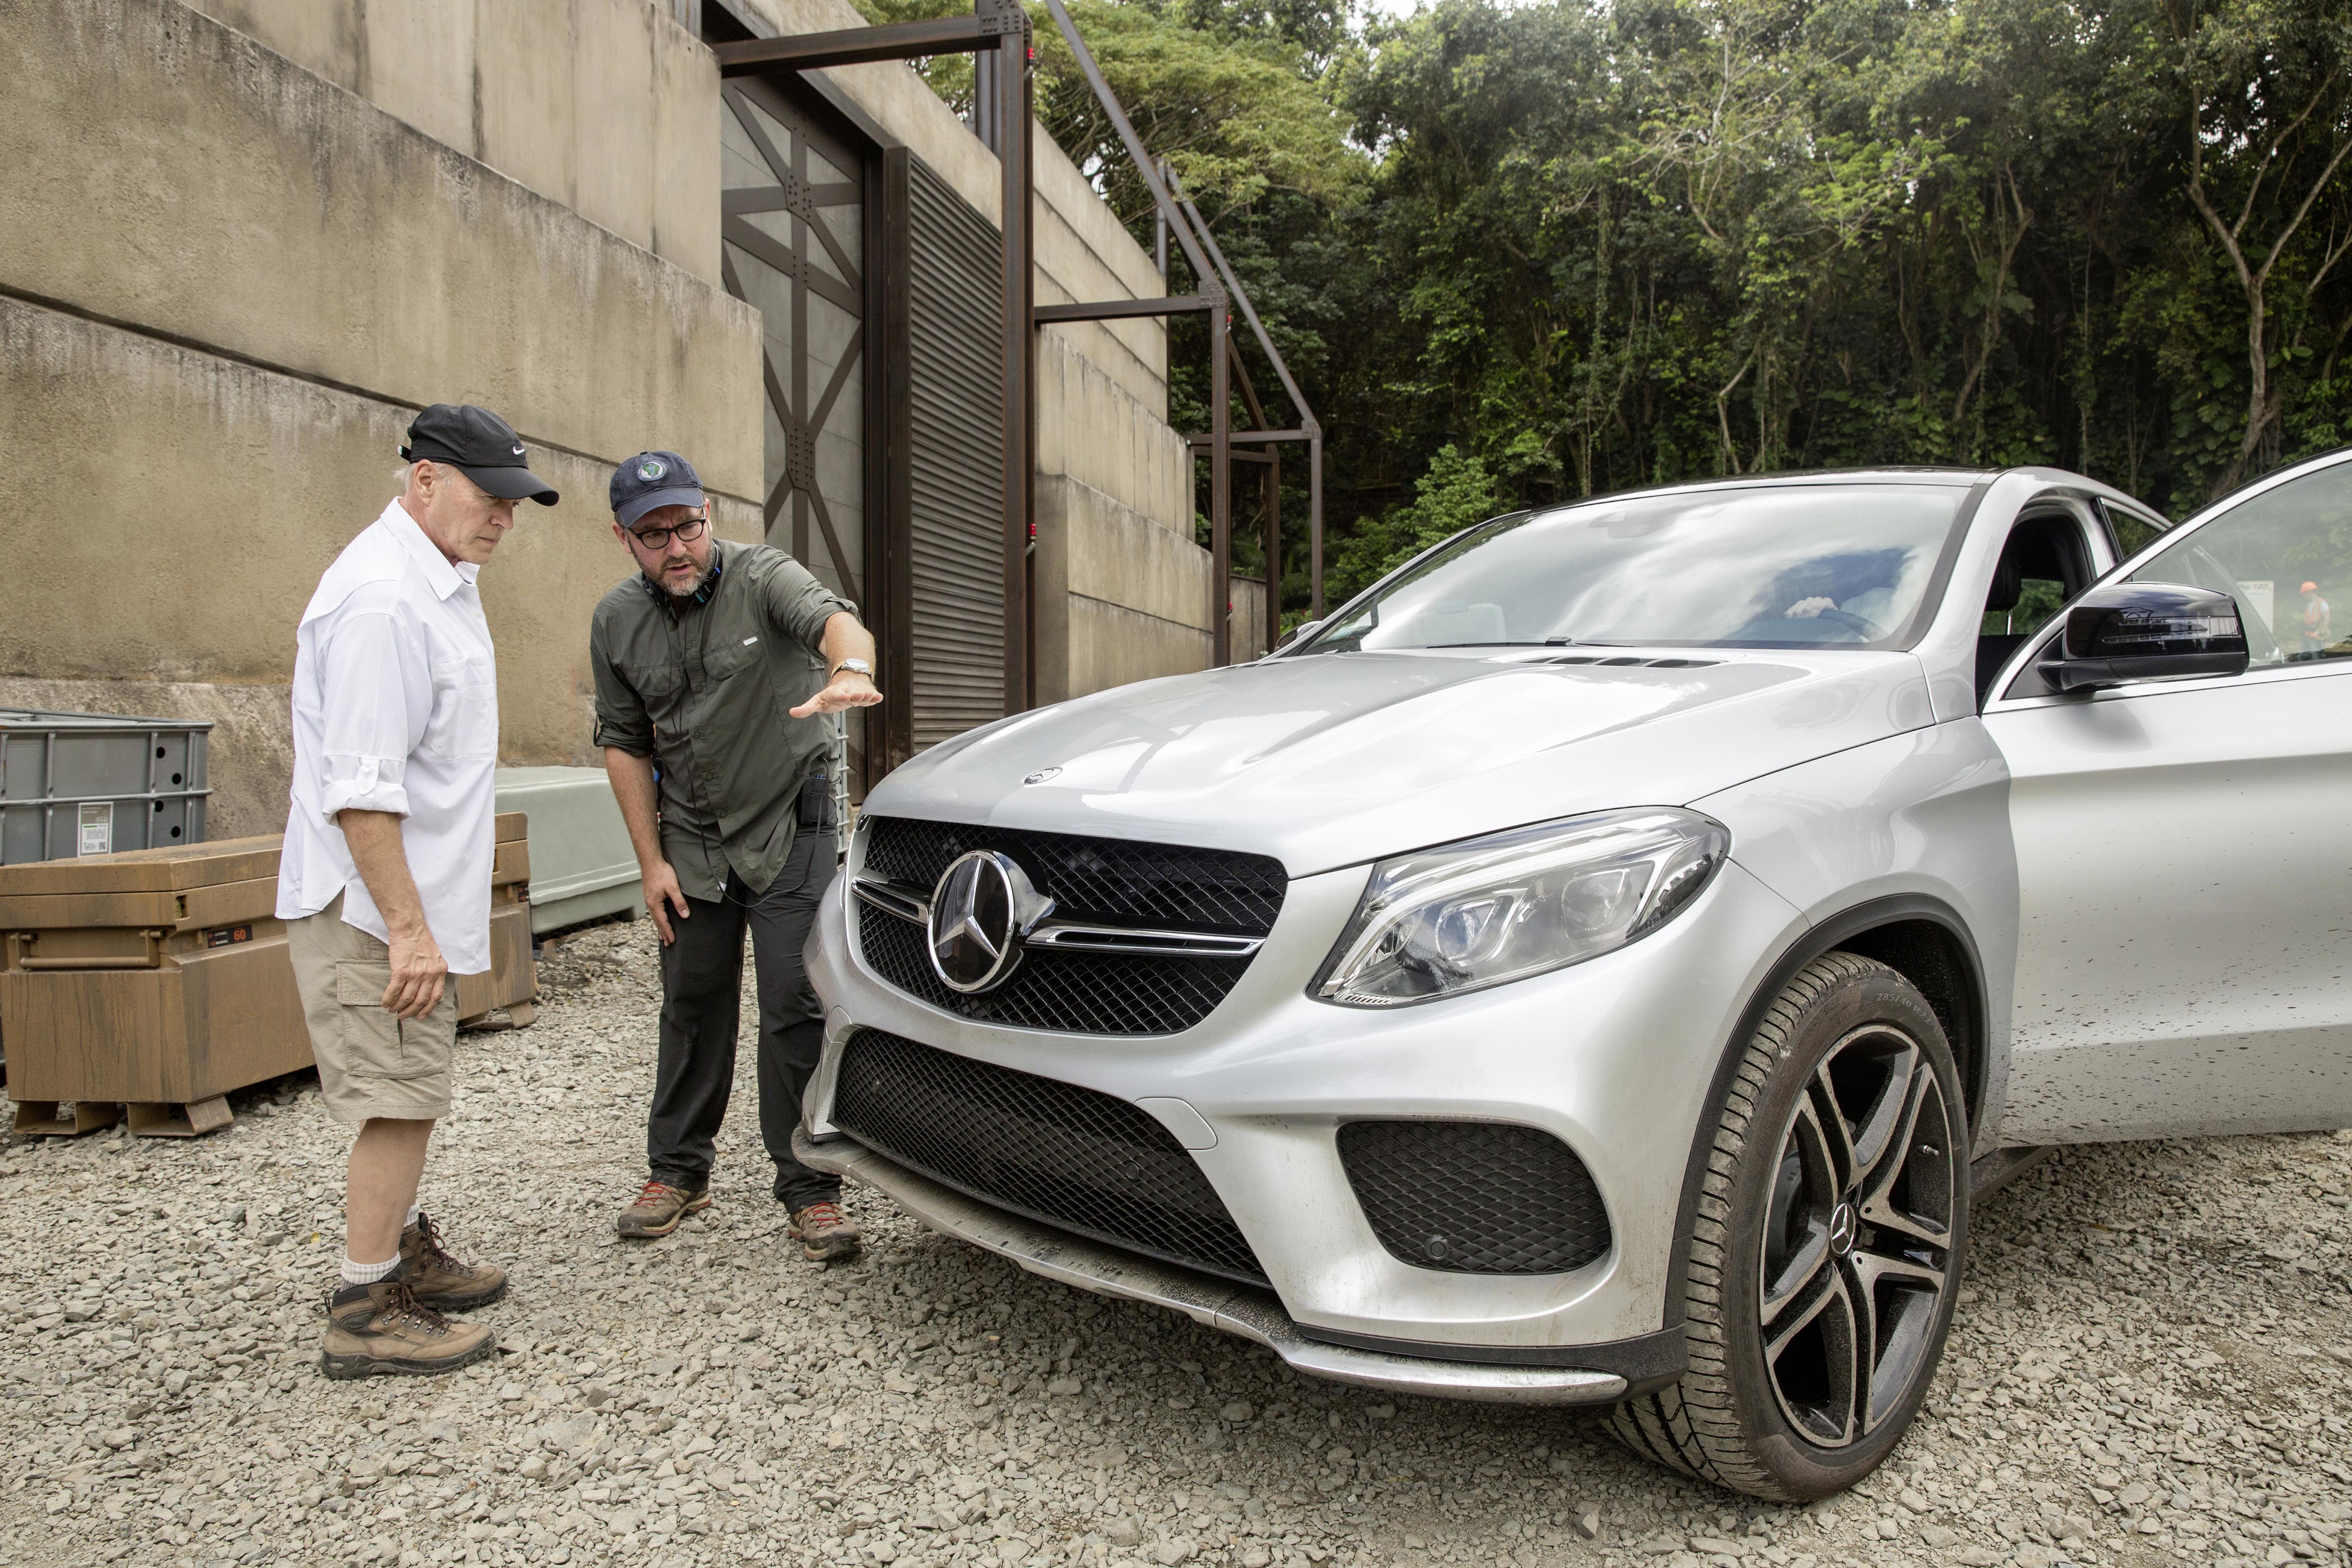 mercedes gle test drive – Mercedes Auto Blog